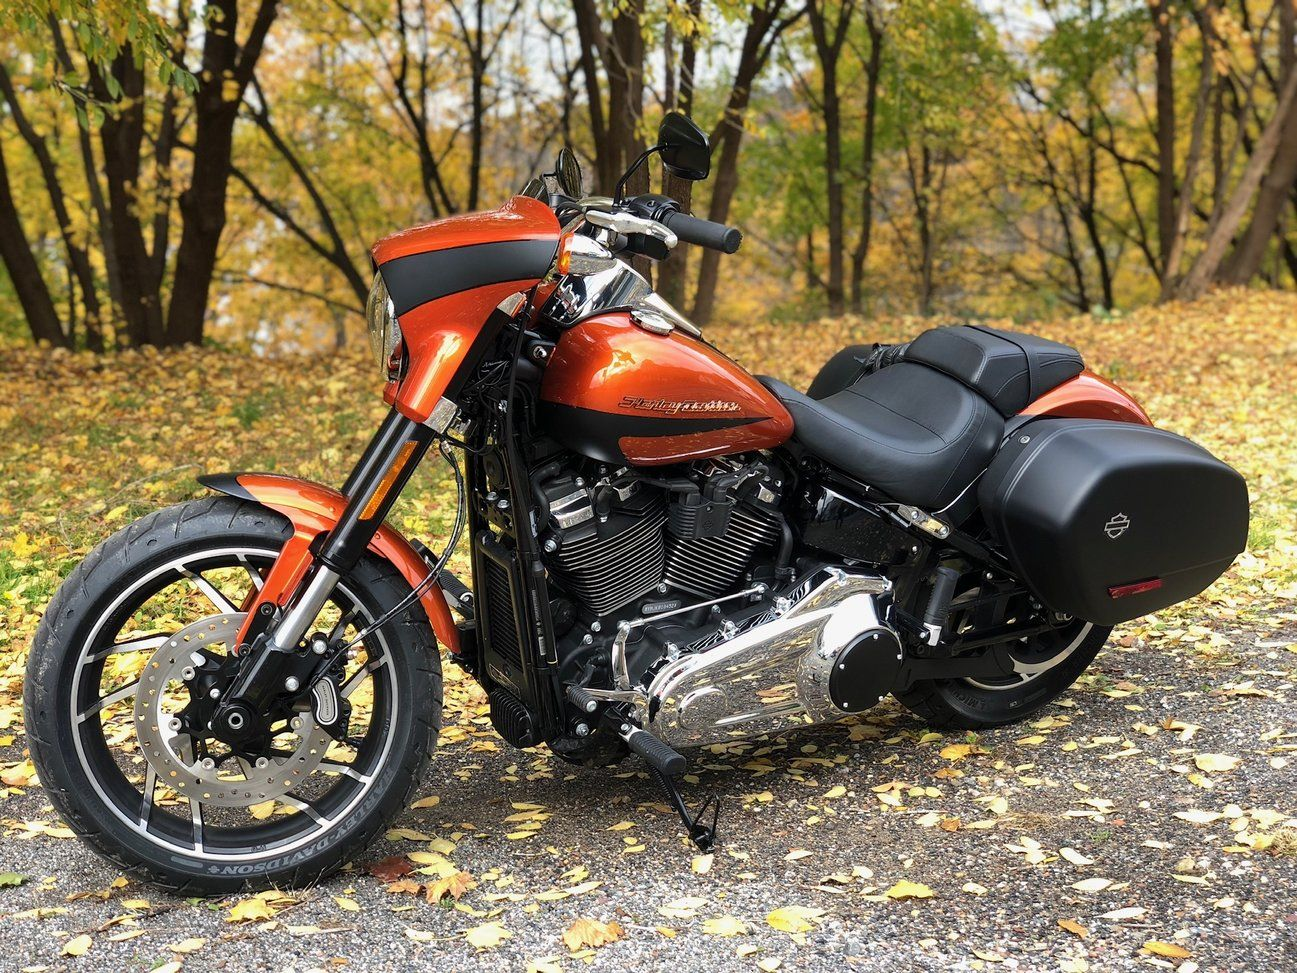 Pin On Harley Davidson Motorcycles